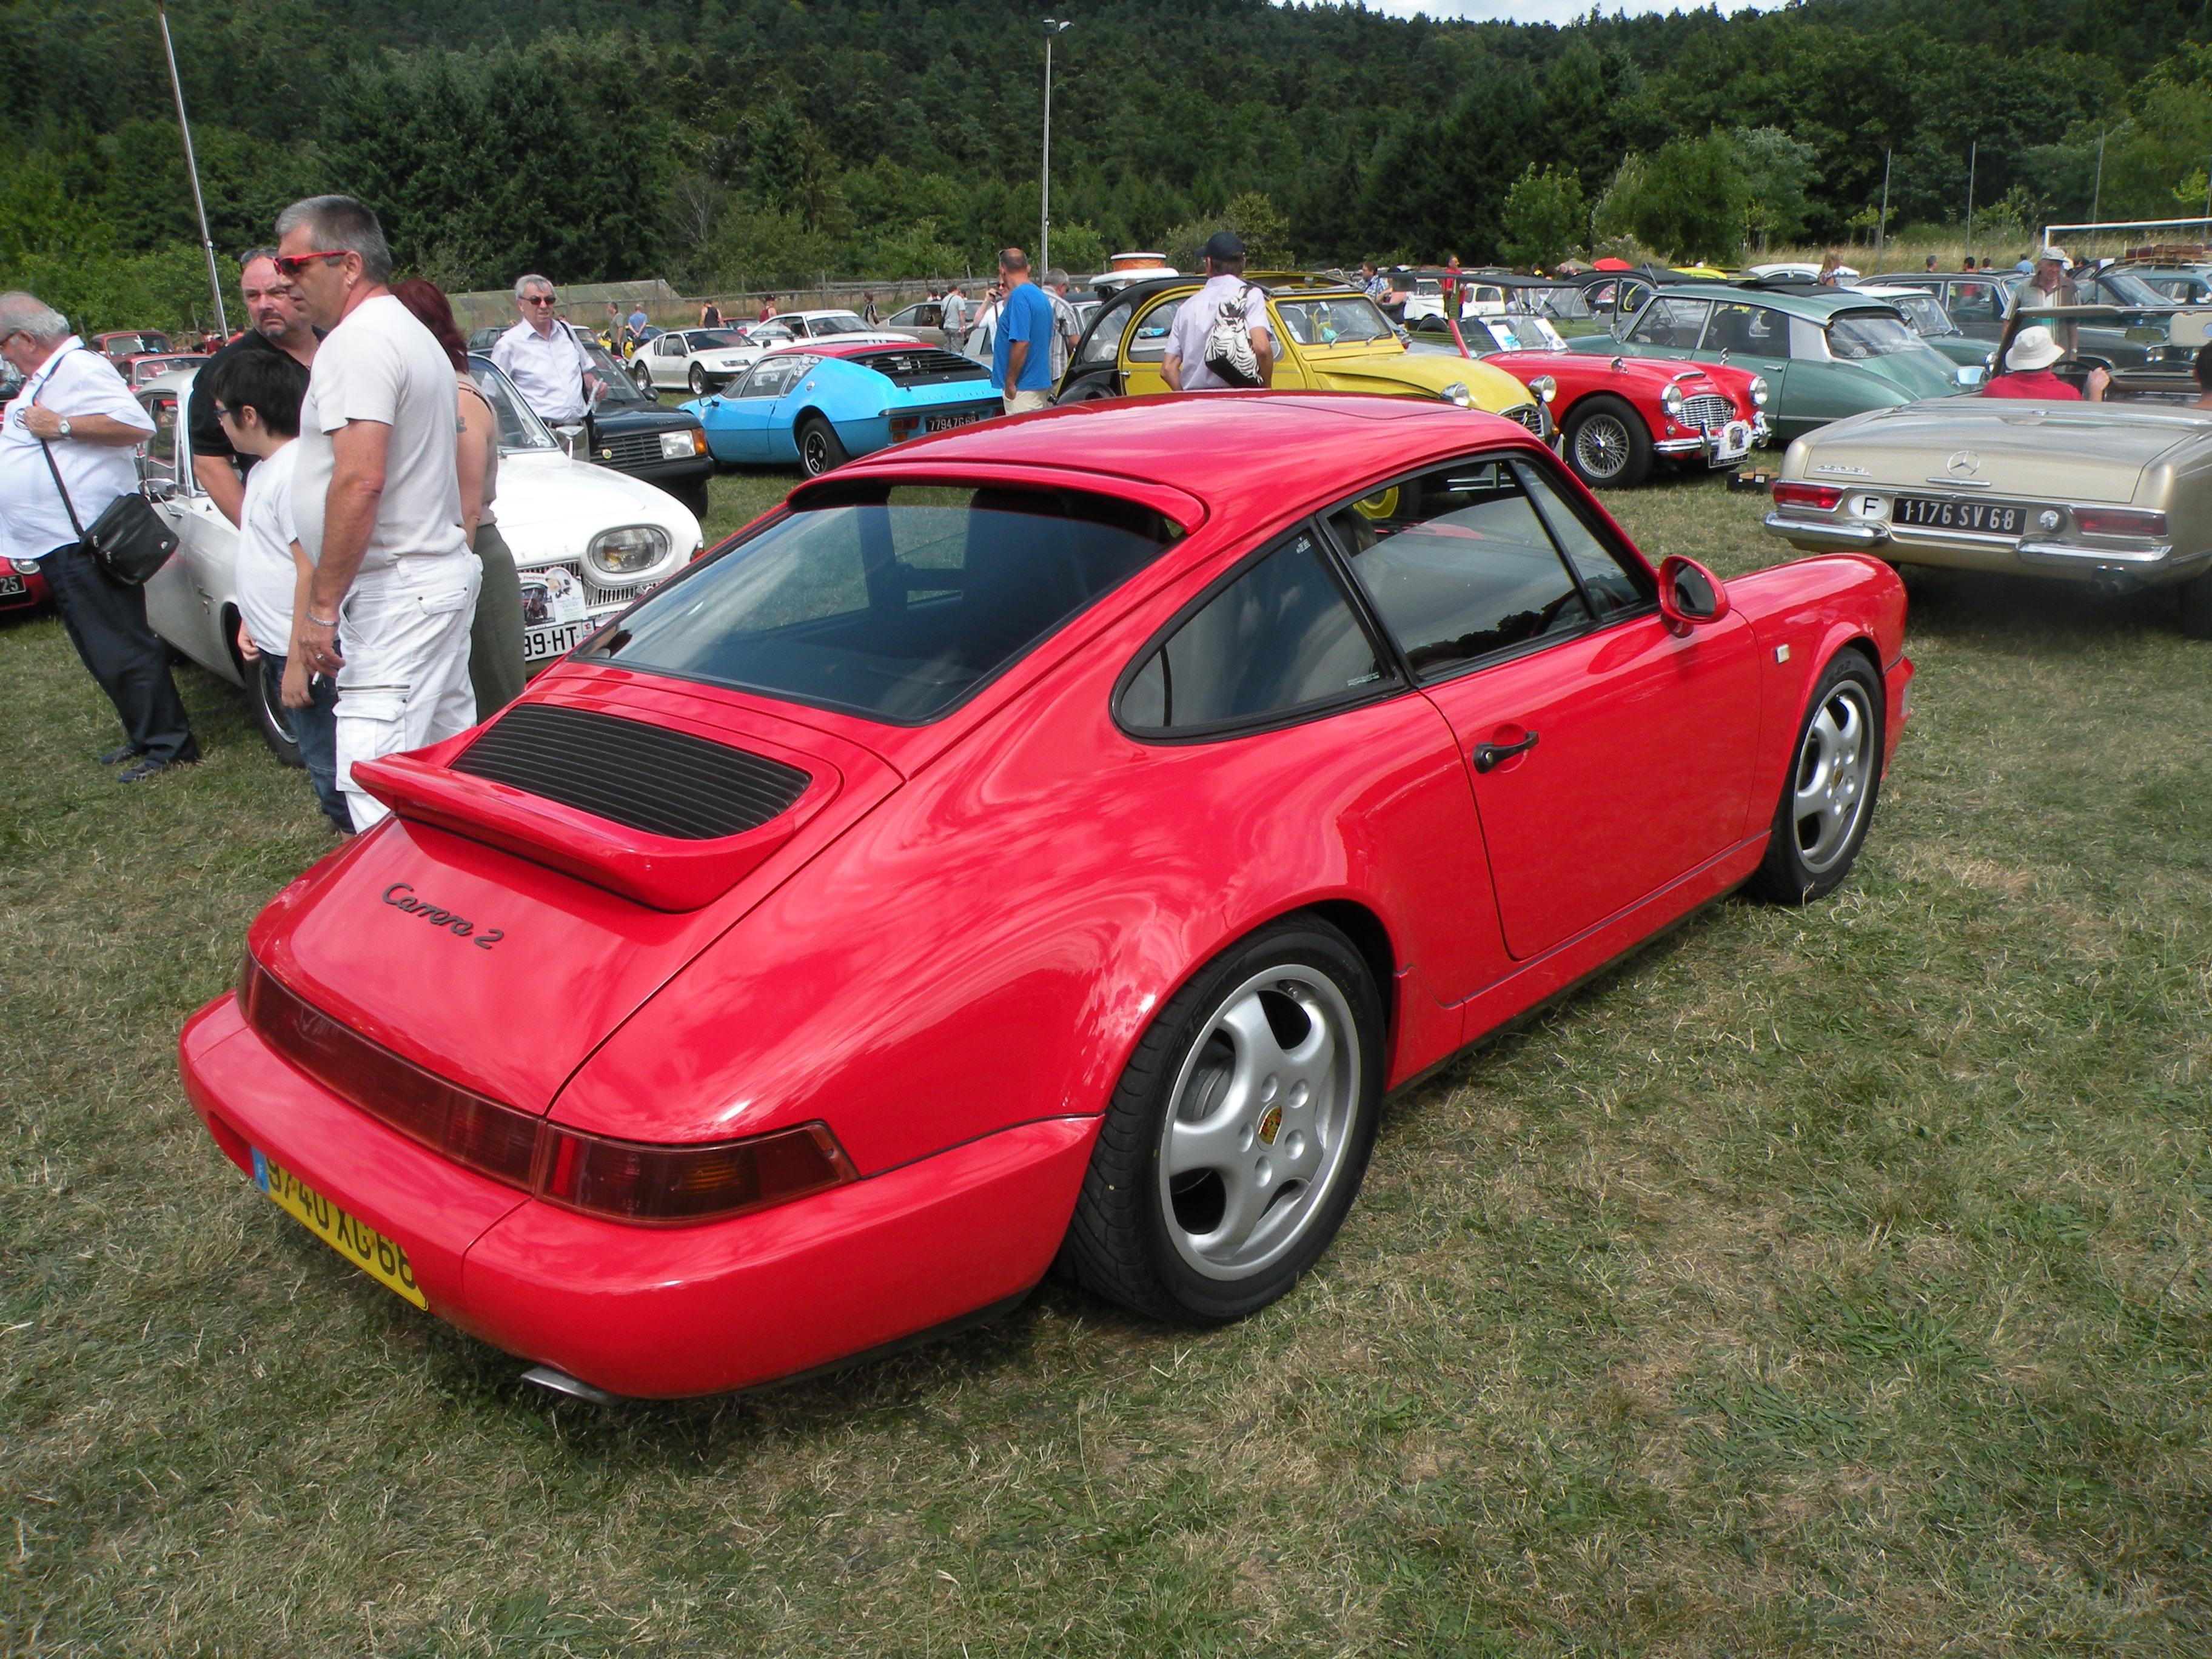 Expo Auto-Moto à Thannenkirch du 18.08.2013 8f68